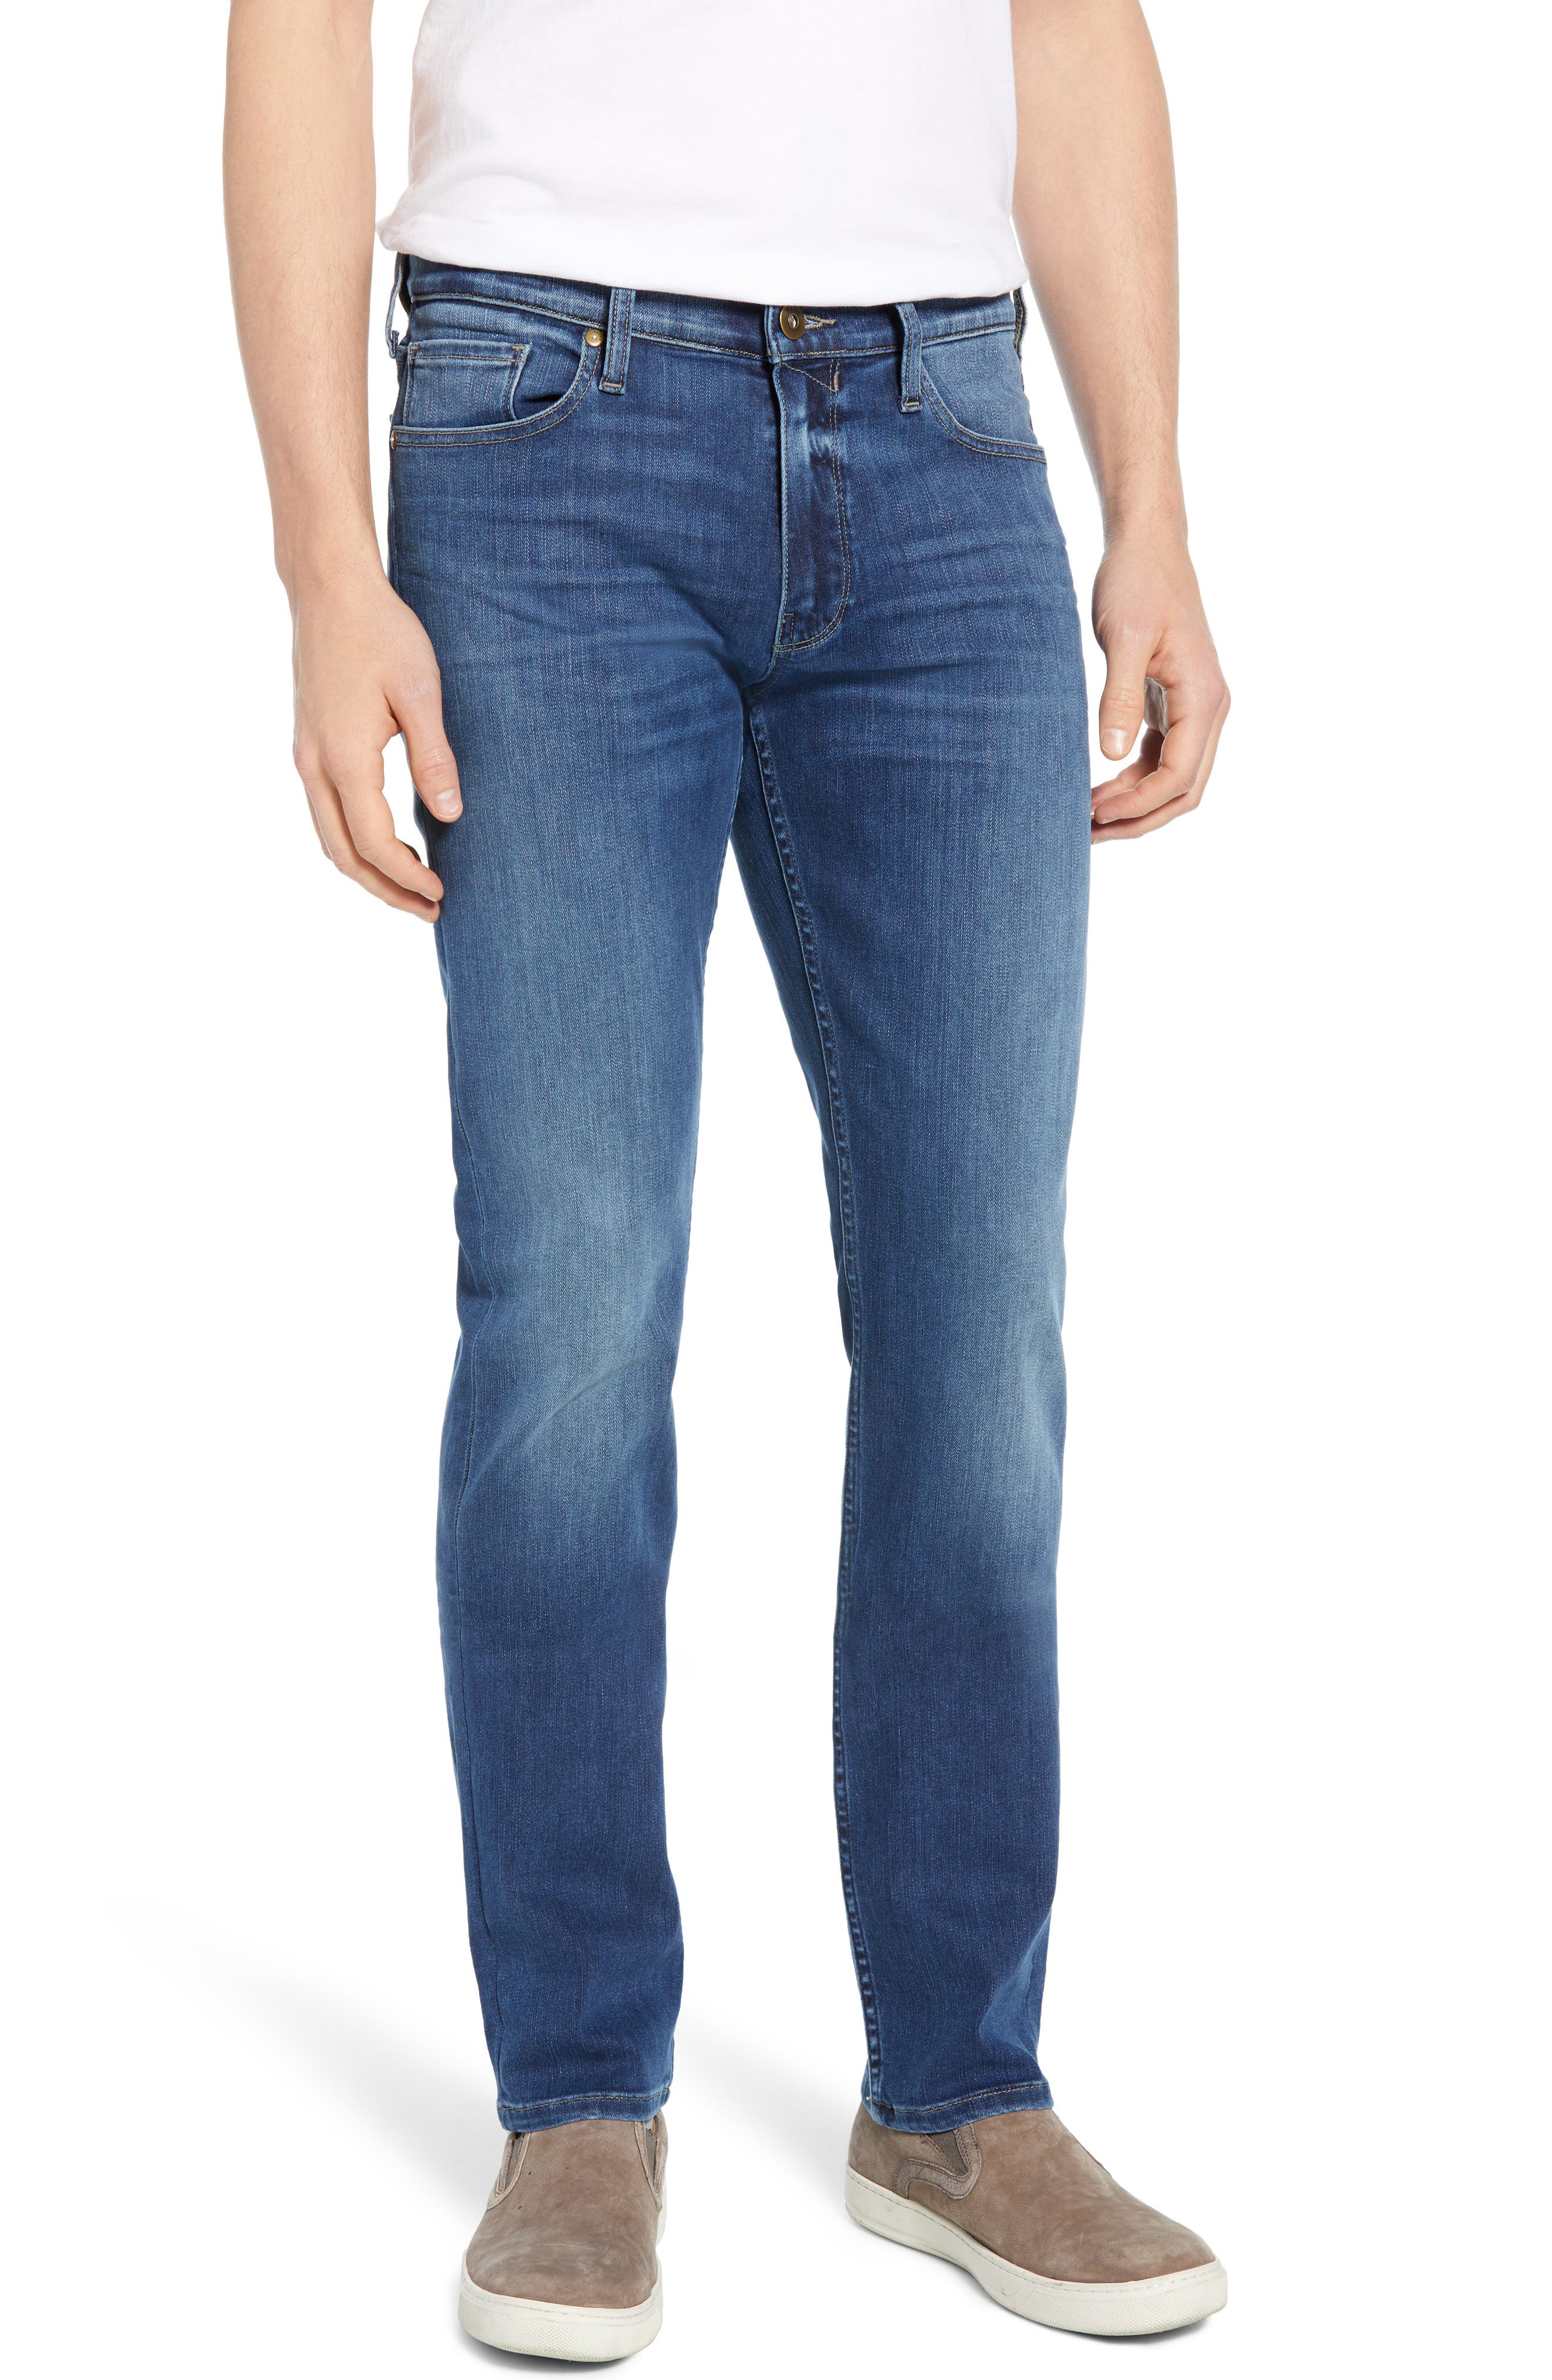 Transcend Vintage - Lennox Slim Fit Jeans, Main, color, PRESTON